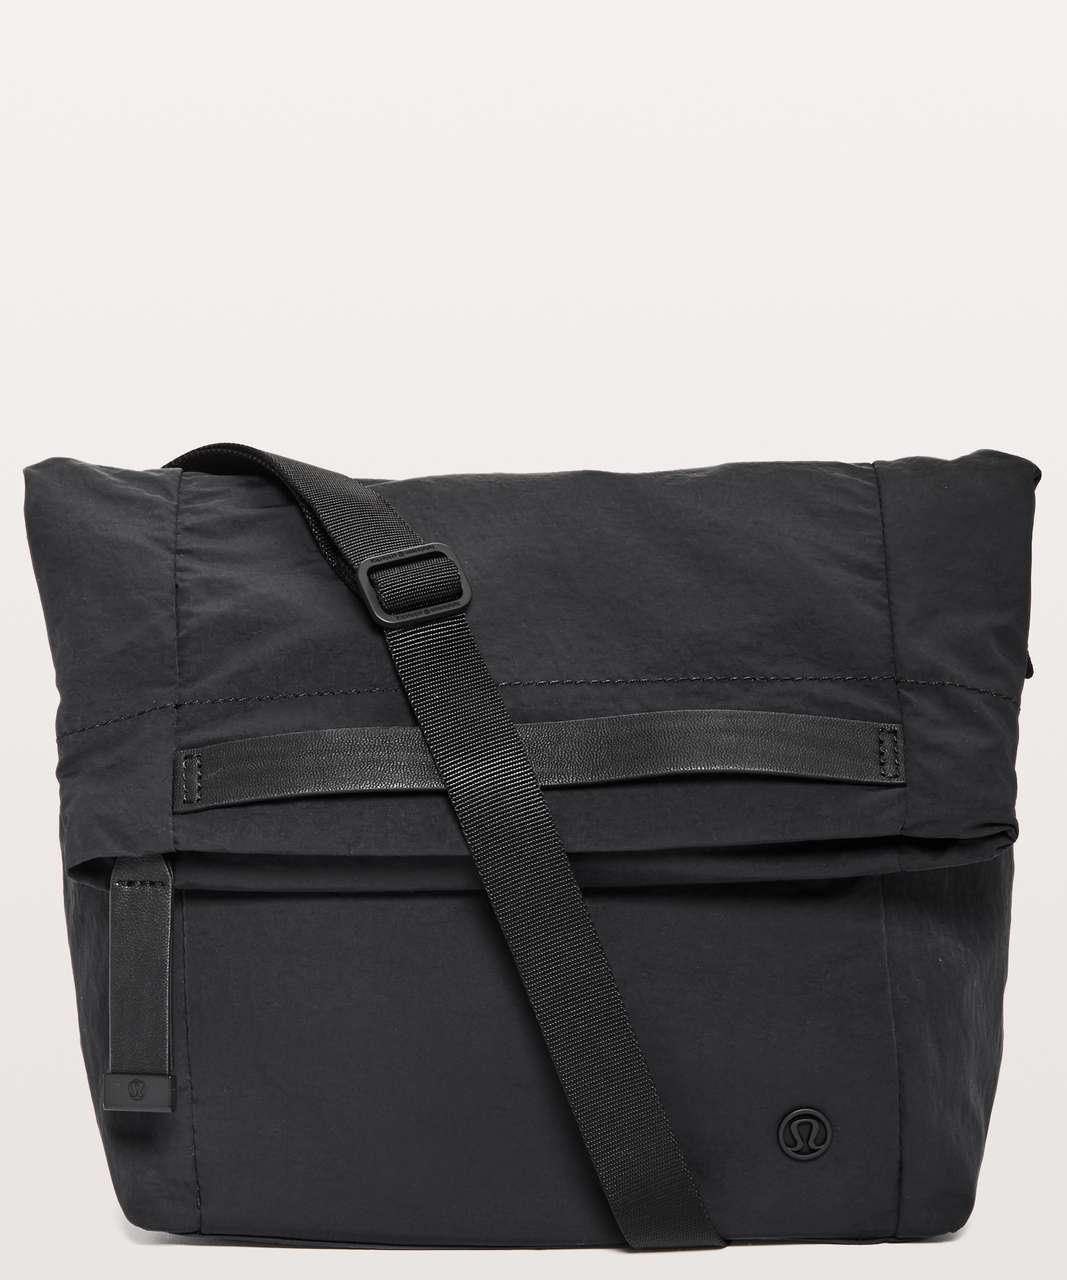 1578a82862b Lululemon On My Level Crossbody Bag *6L - Black - lulu fanatics